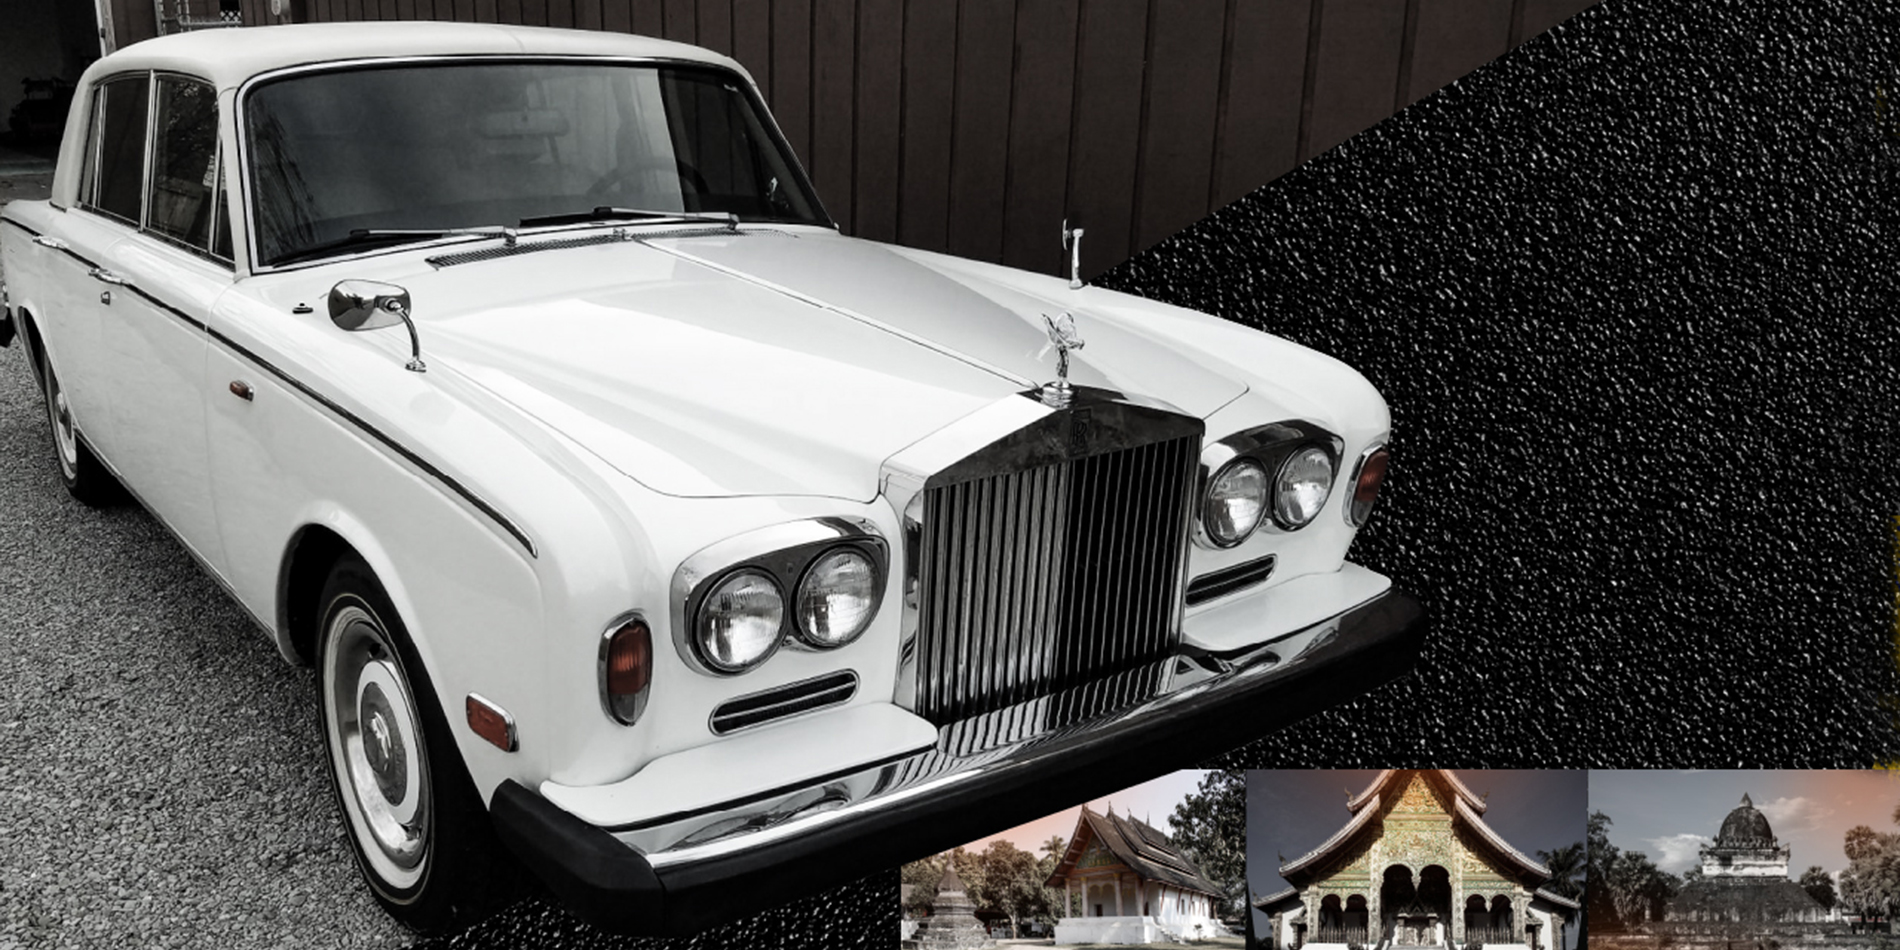 Luang Prabang by Luxury Classic Car